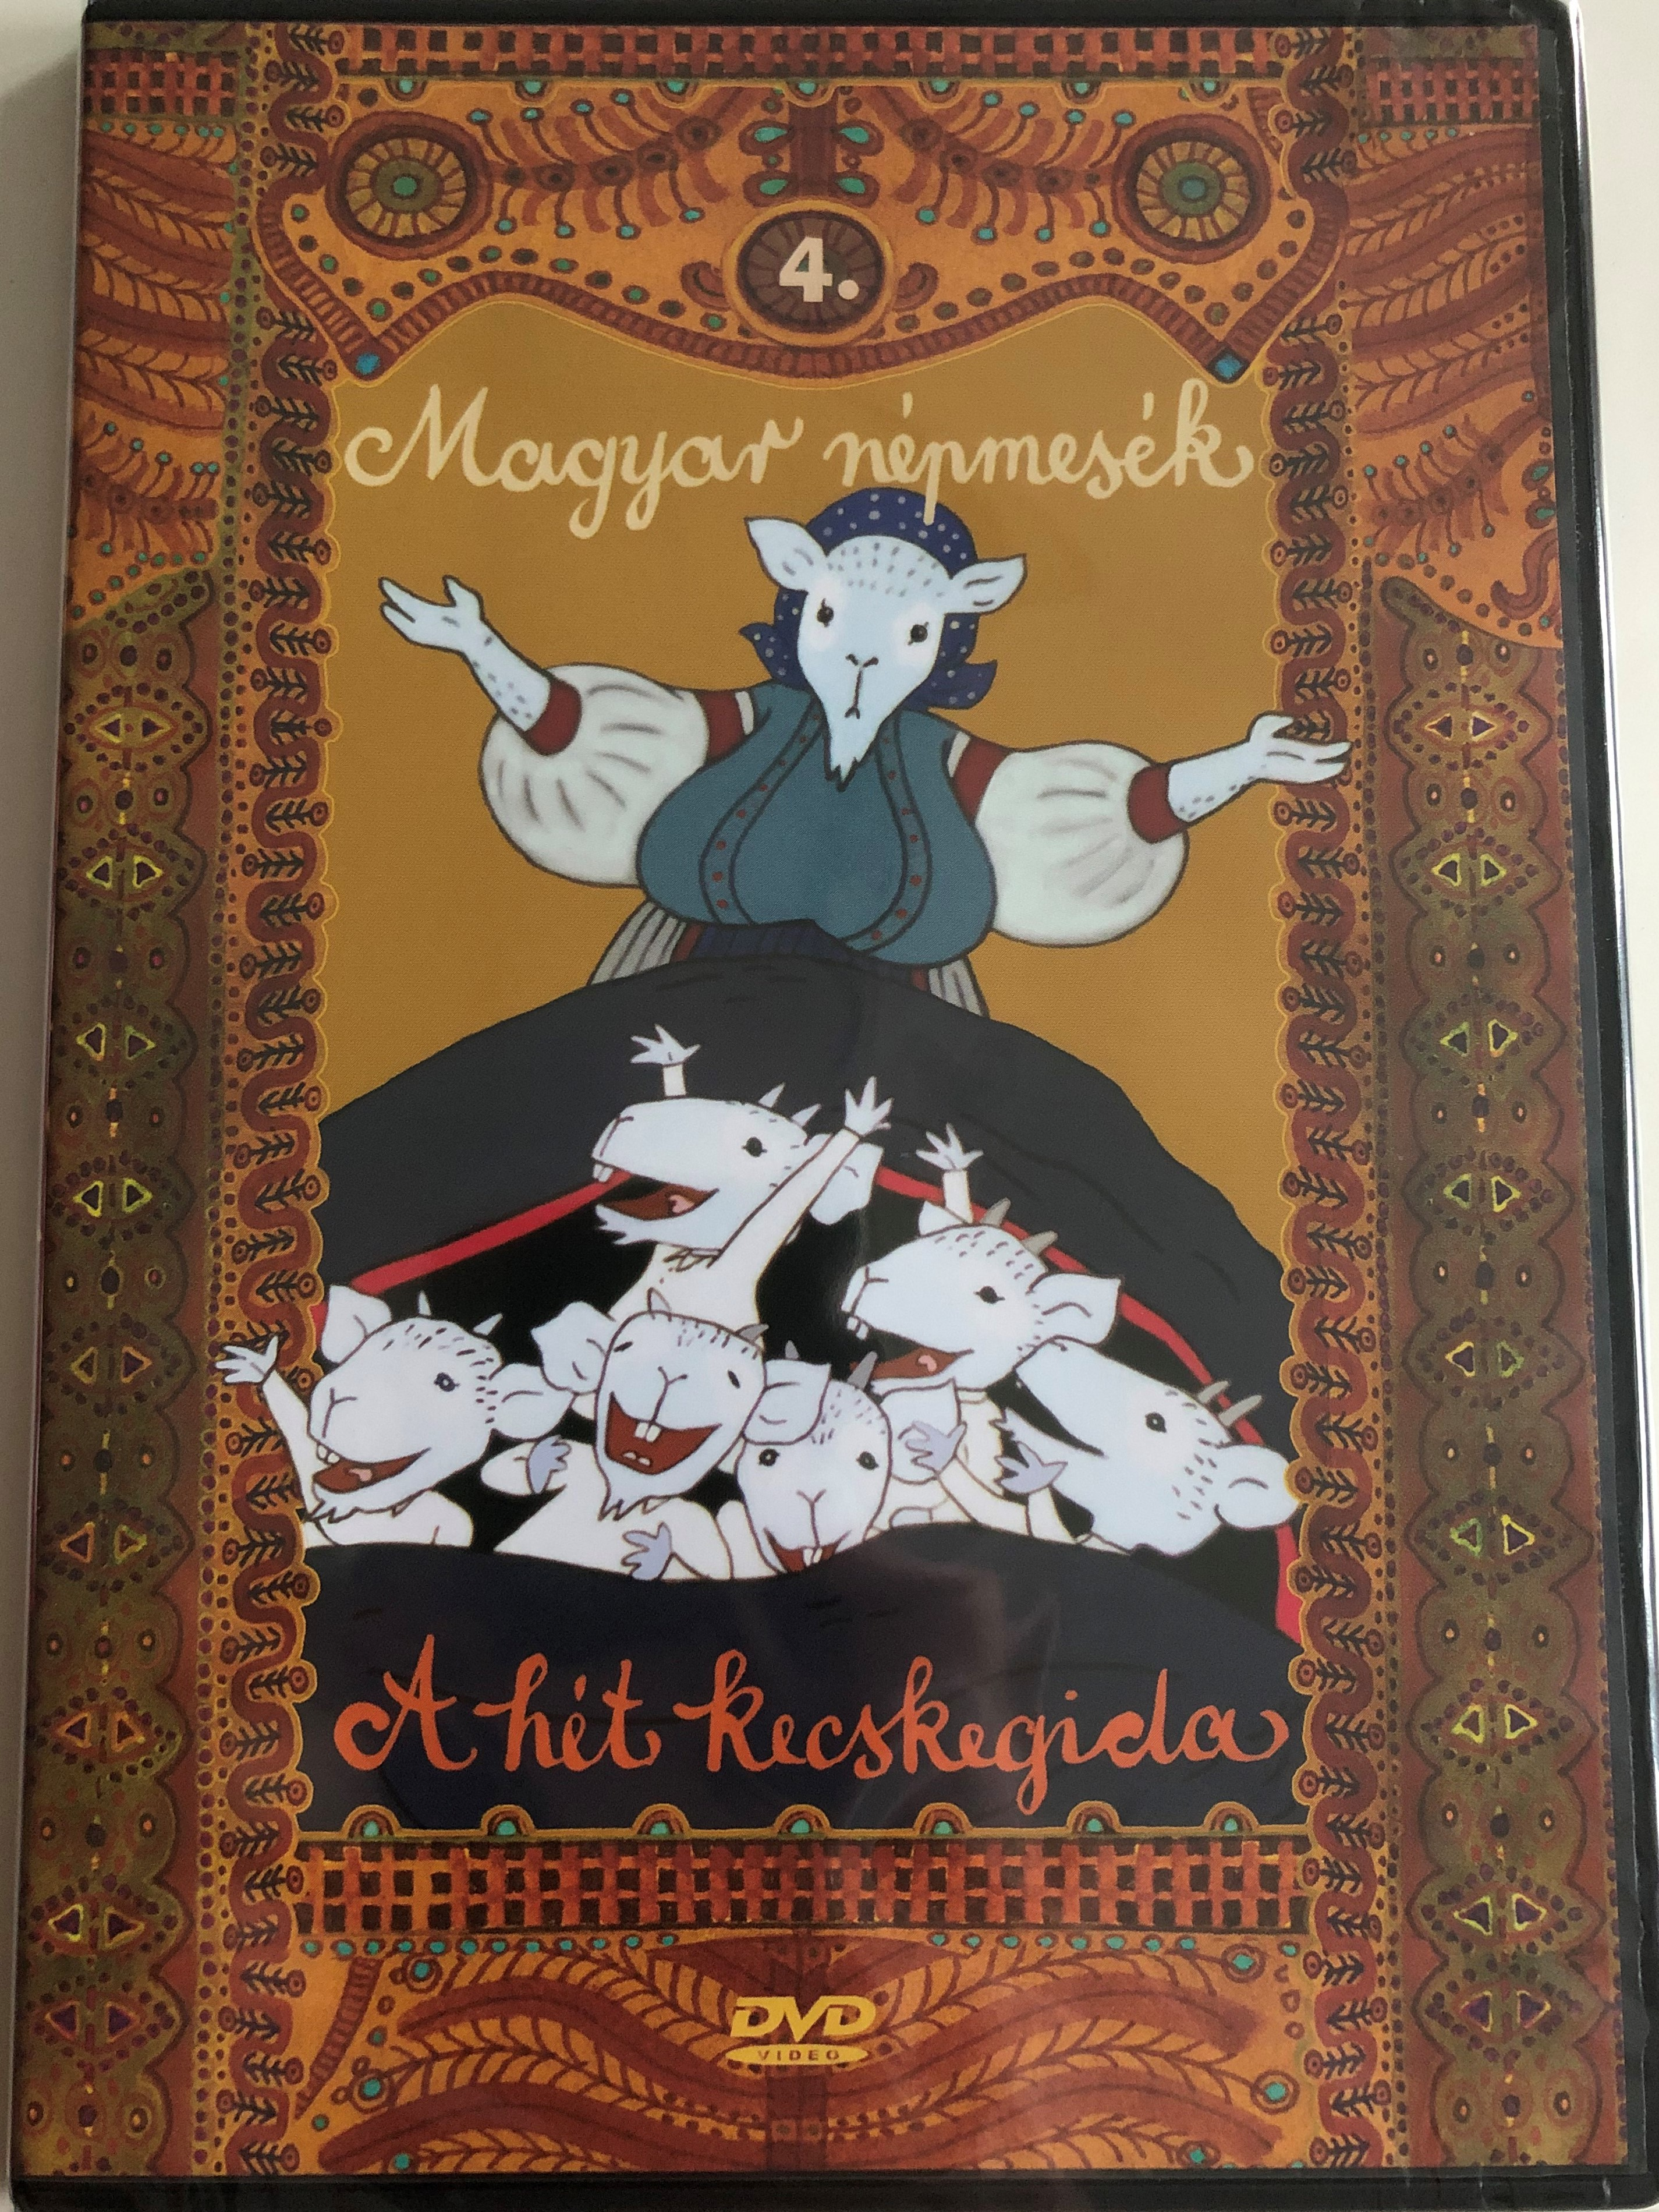 magyar-n-pmes-k-4.-a-h-t-kecskegida-dvd-1989-1990-hungarian-folk-tales-for-children-directed-by-jankovics-marcell-1-.jpg